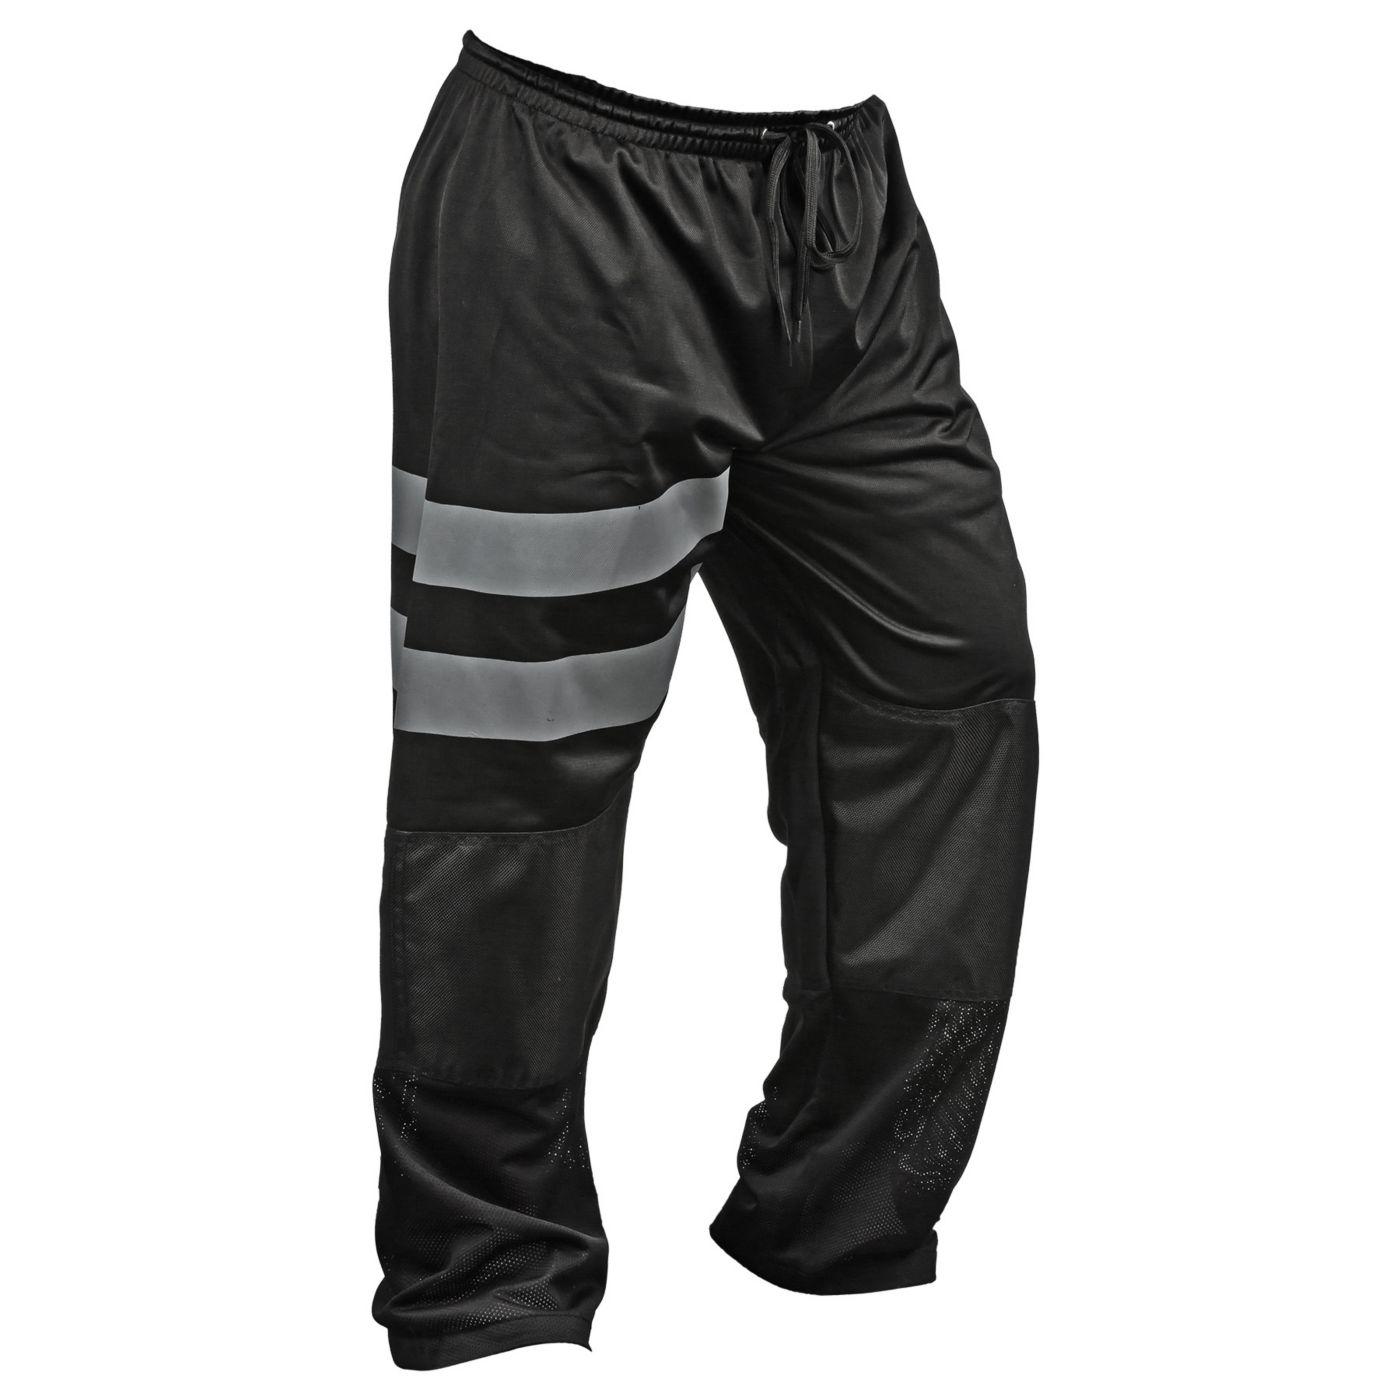 TOUR Adult Spartan XT Roller Hockey Pants